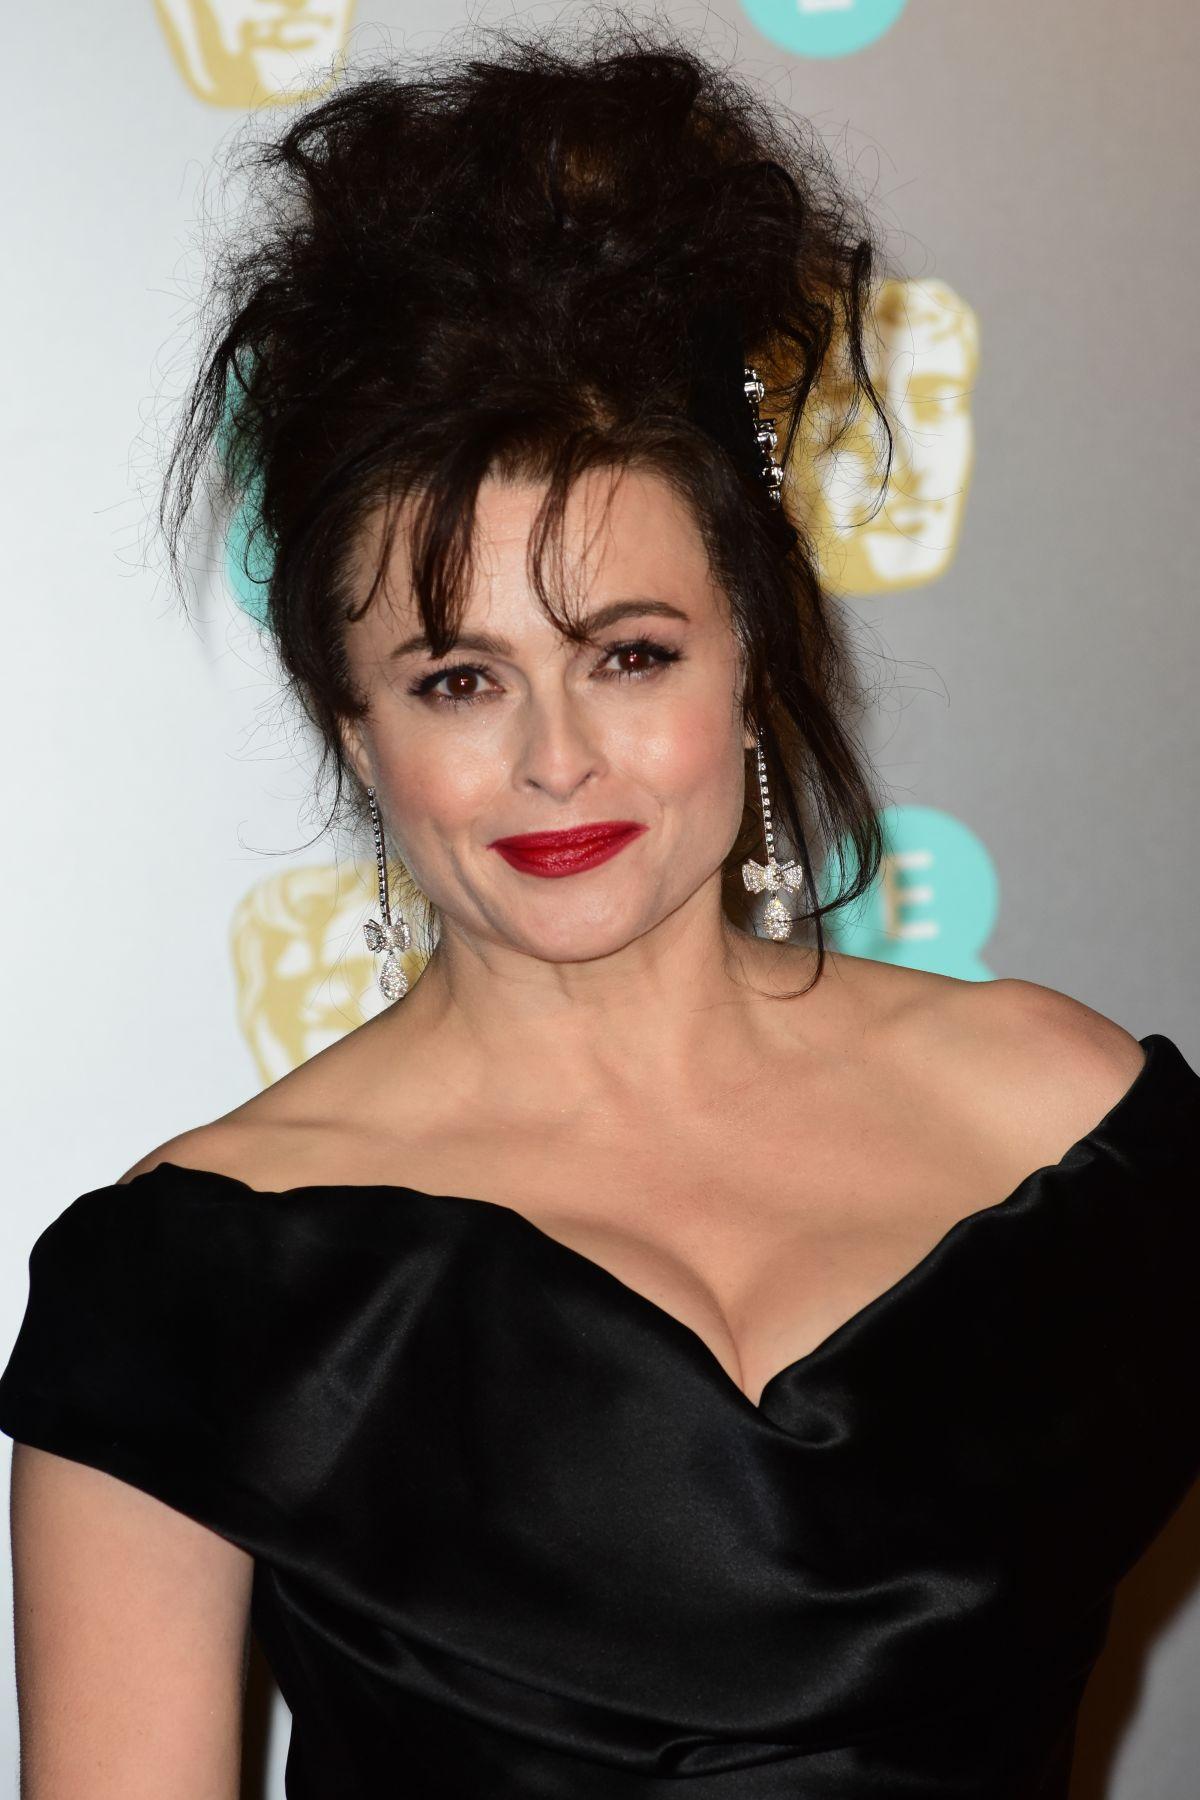 helena bonham carter at bafta film awards 2018 in london